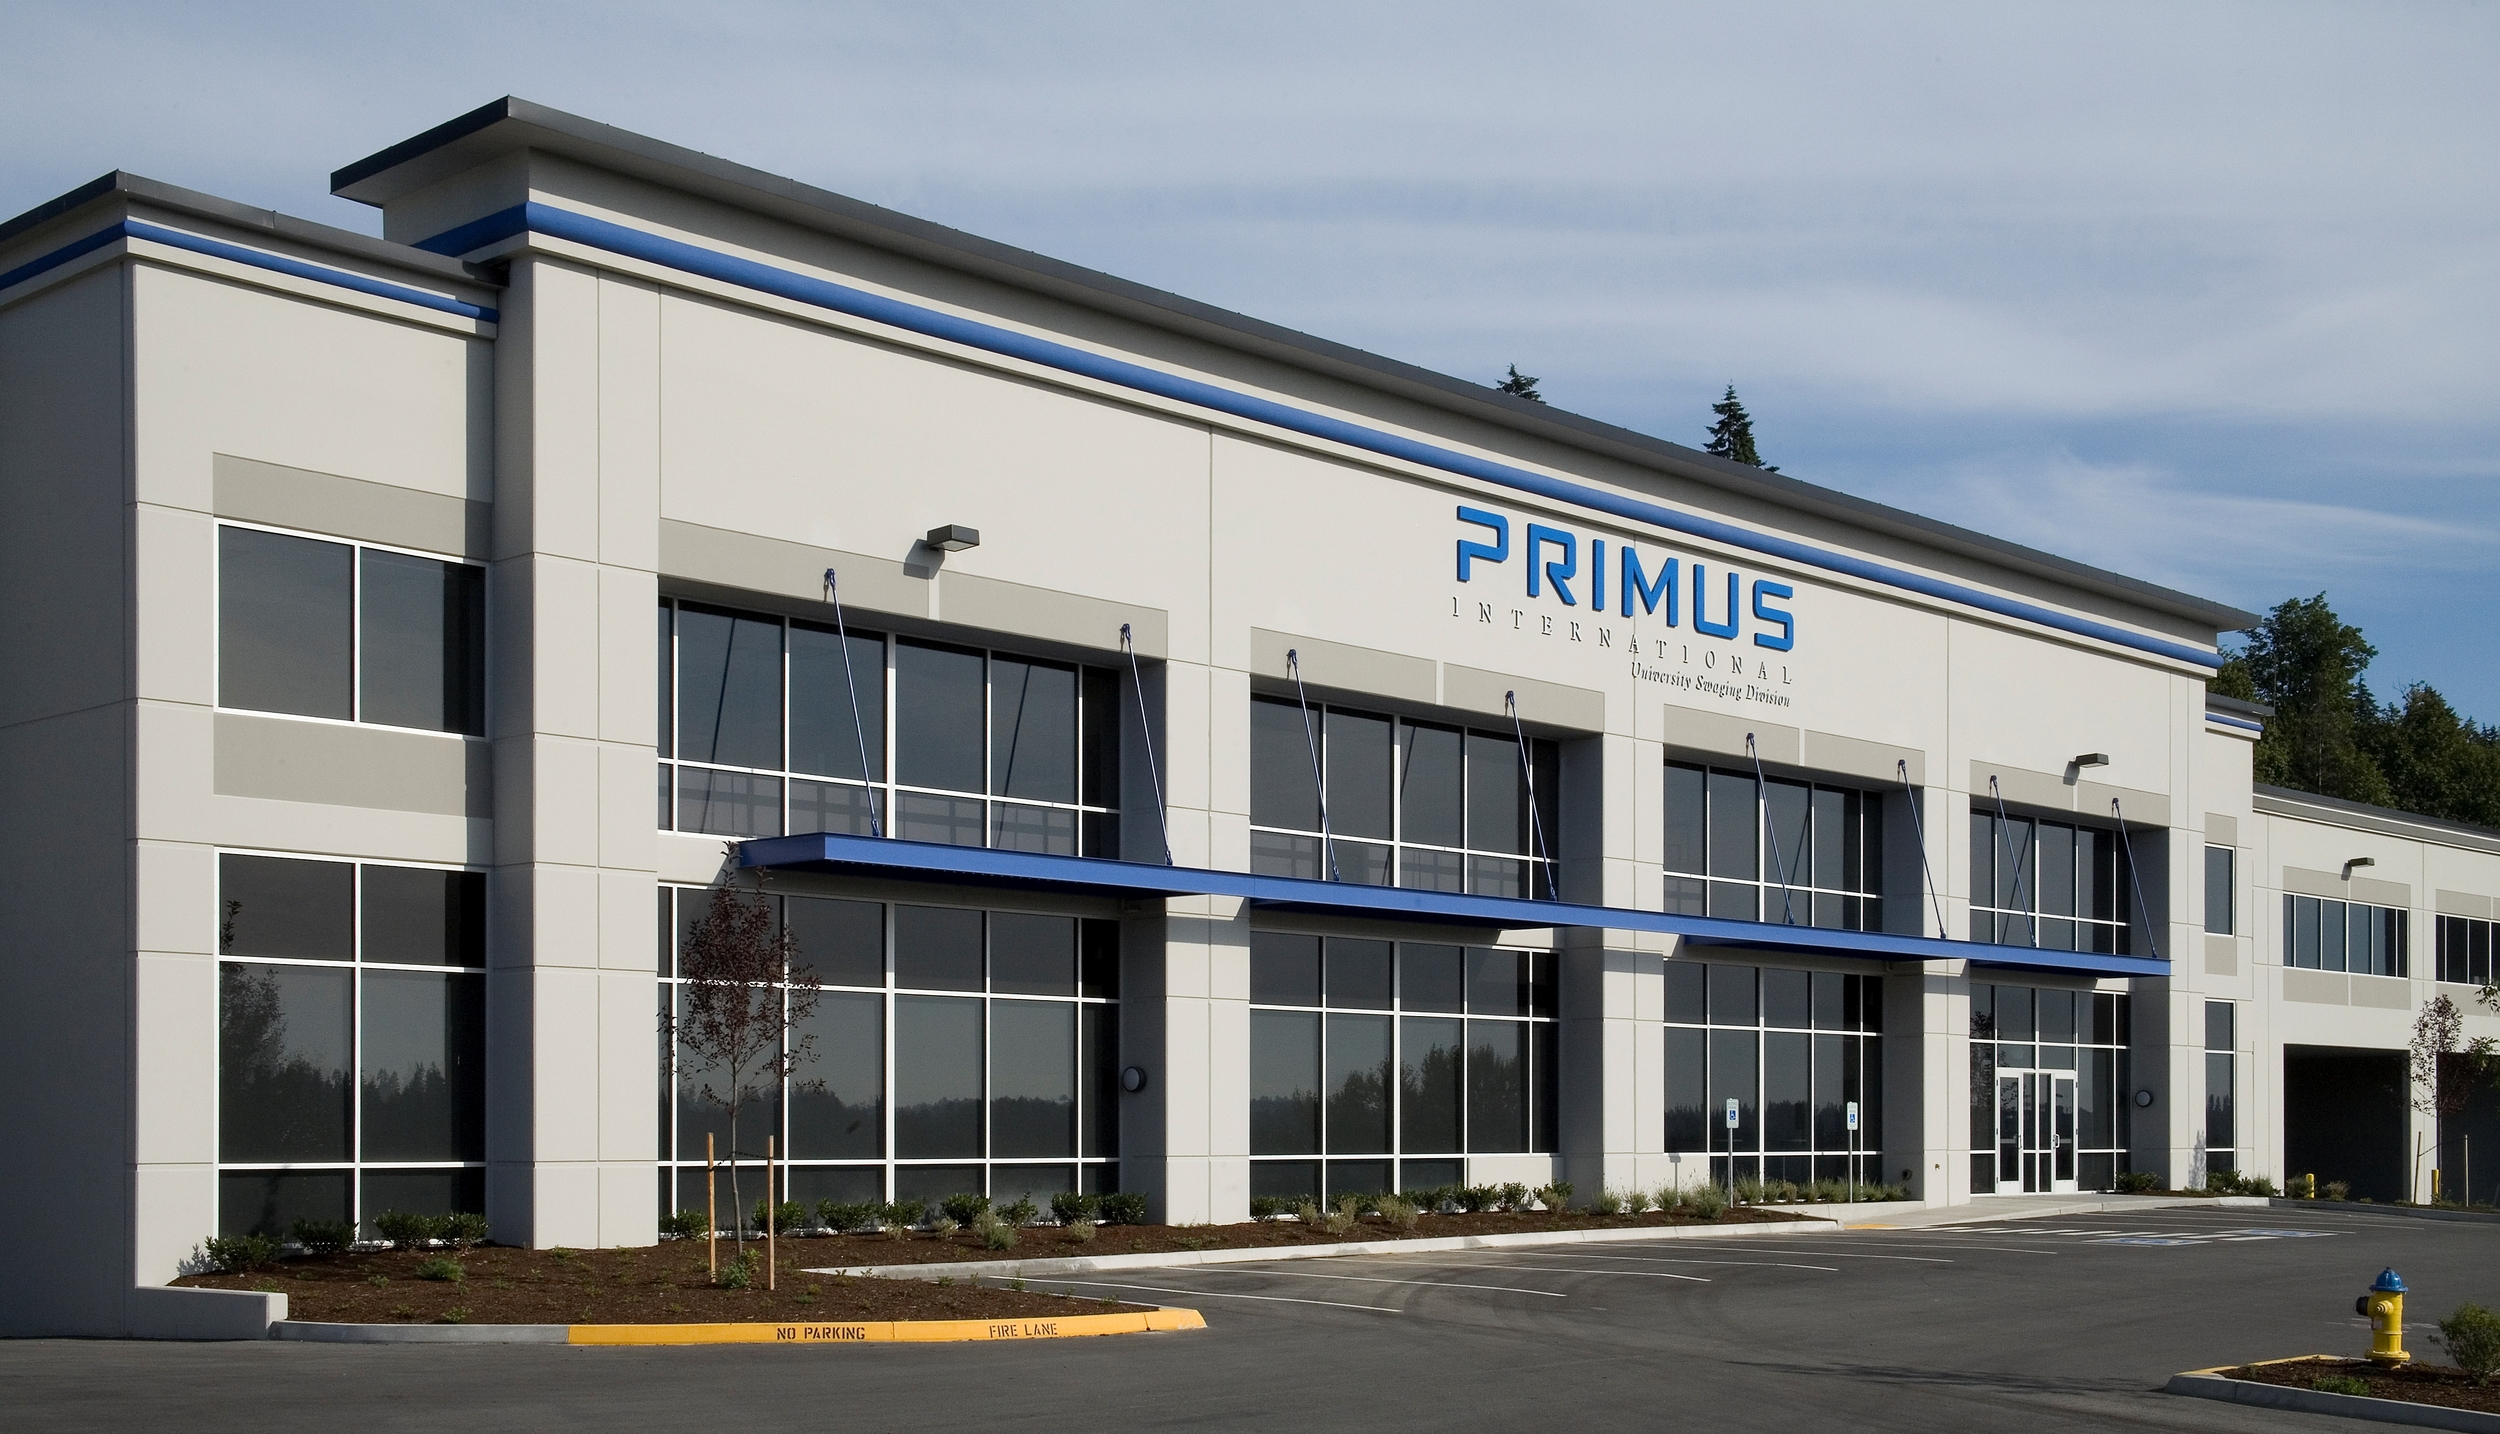 Primus Final Photo #1.jpg